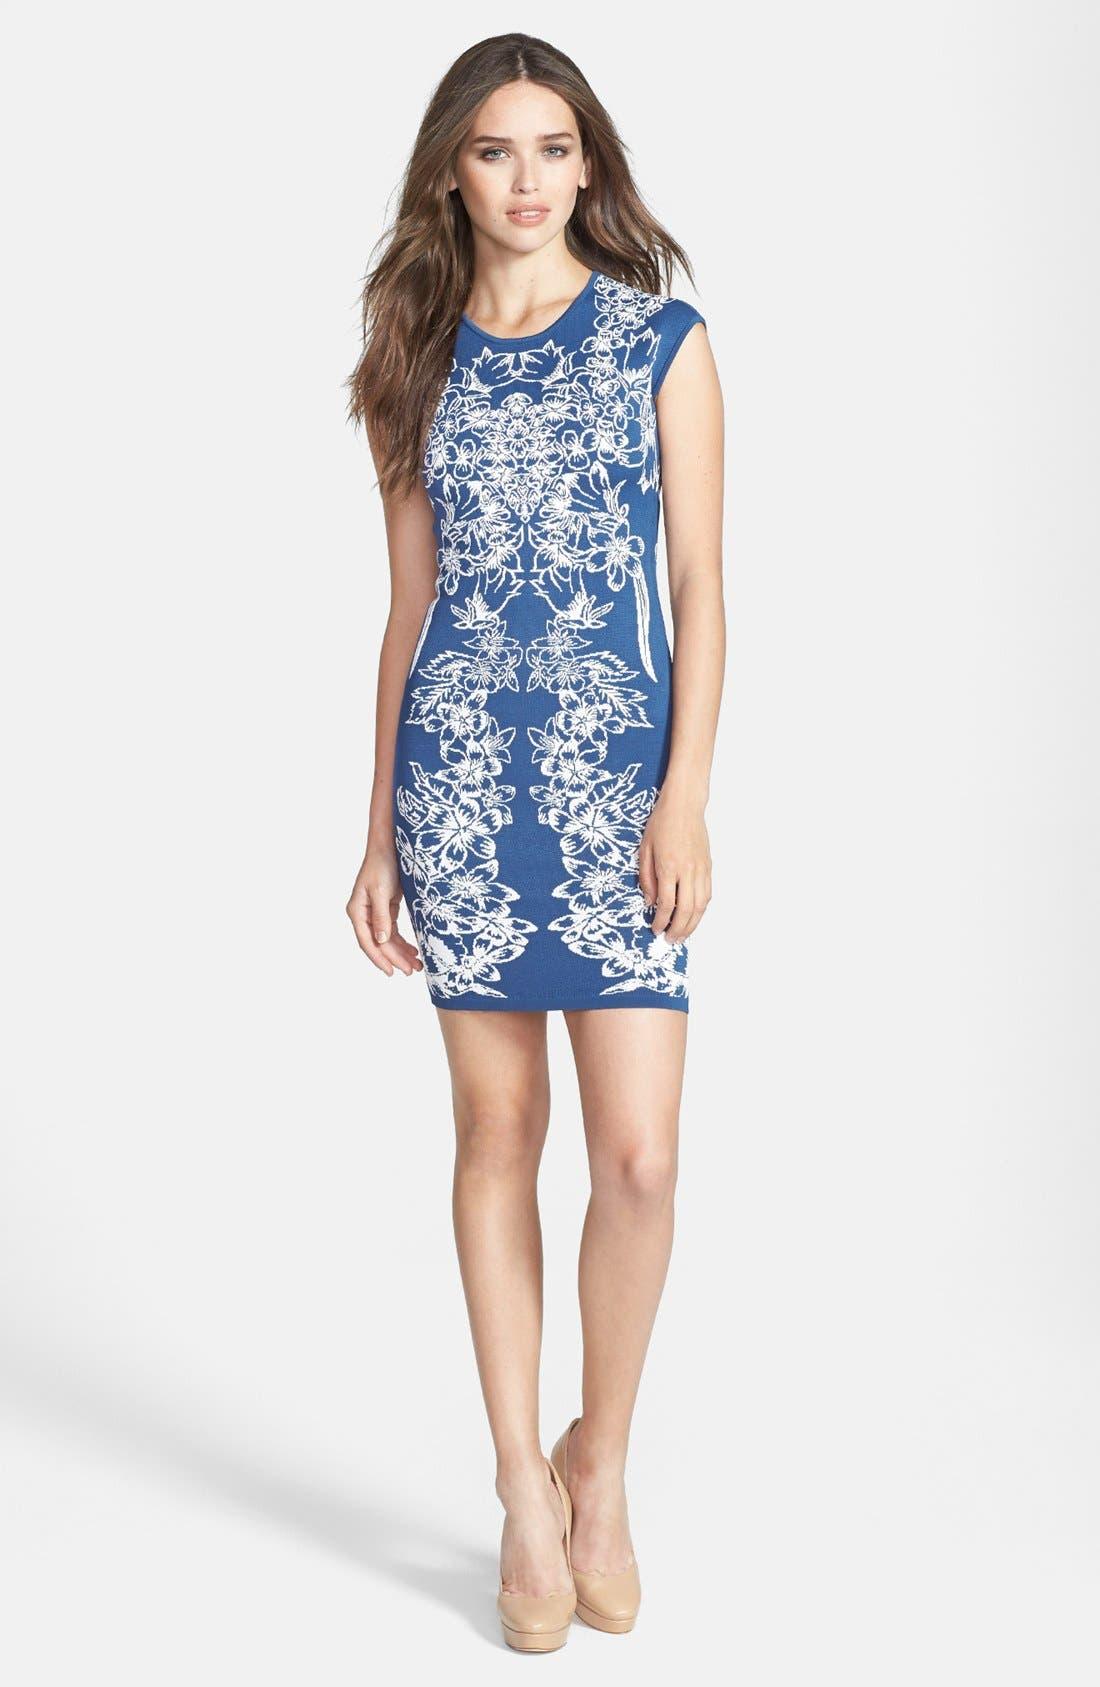 Alternate Image 1 Selected - BCBGMAXAZRIA Floral Jacquard Body-Con Dress